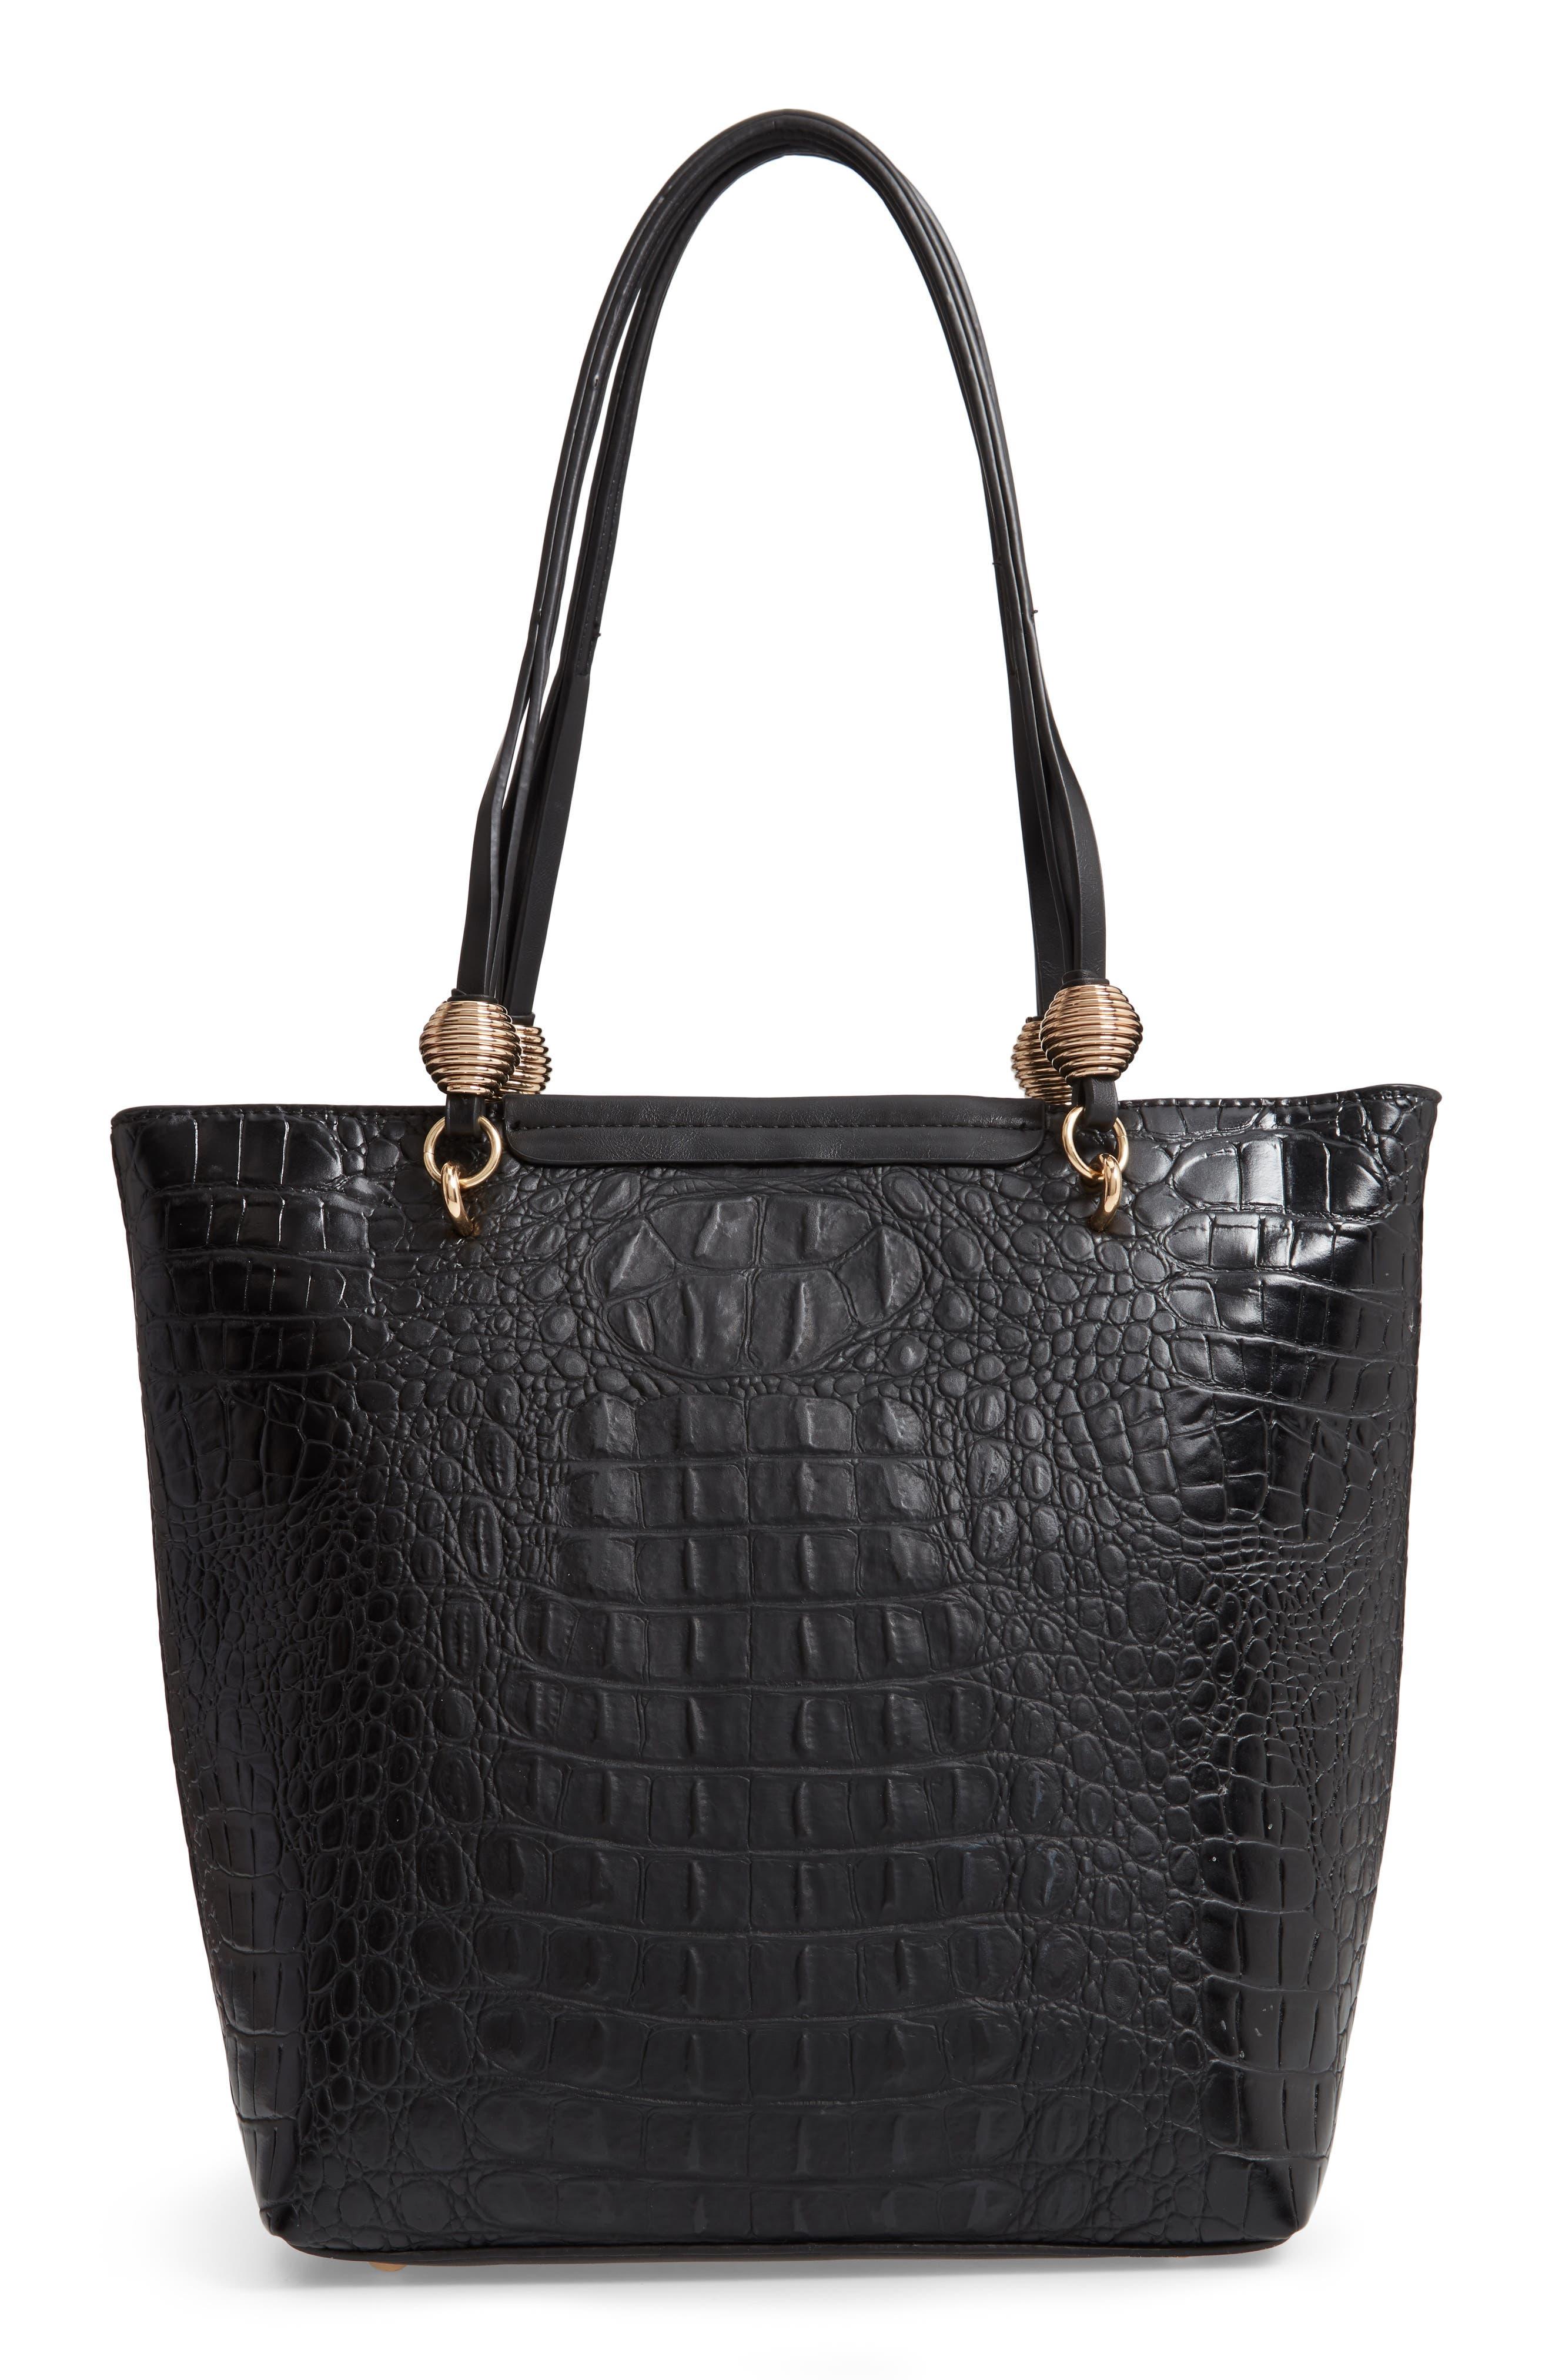 9103bd95b345 Sondra Roberts Handbags   Wallets for Women